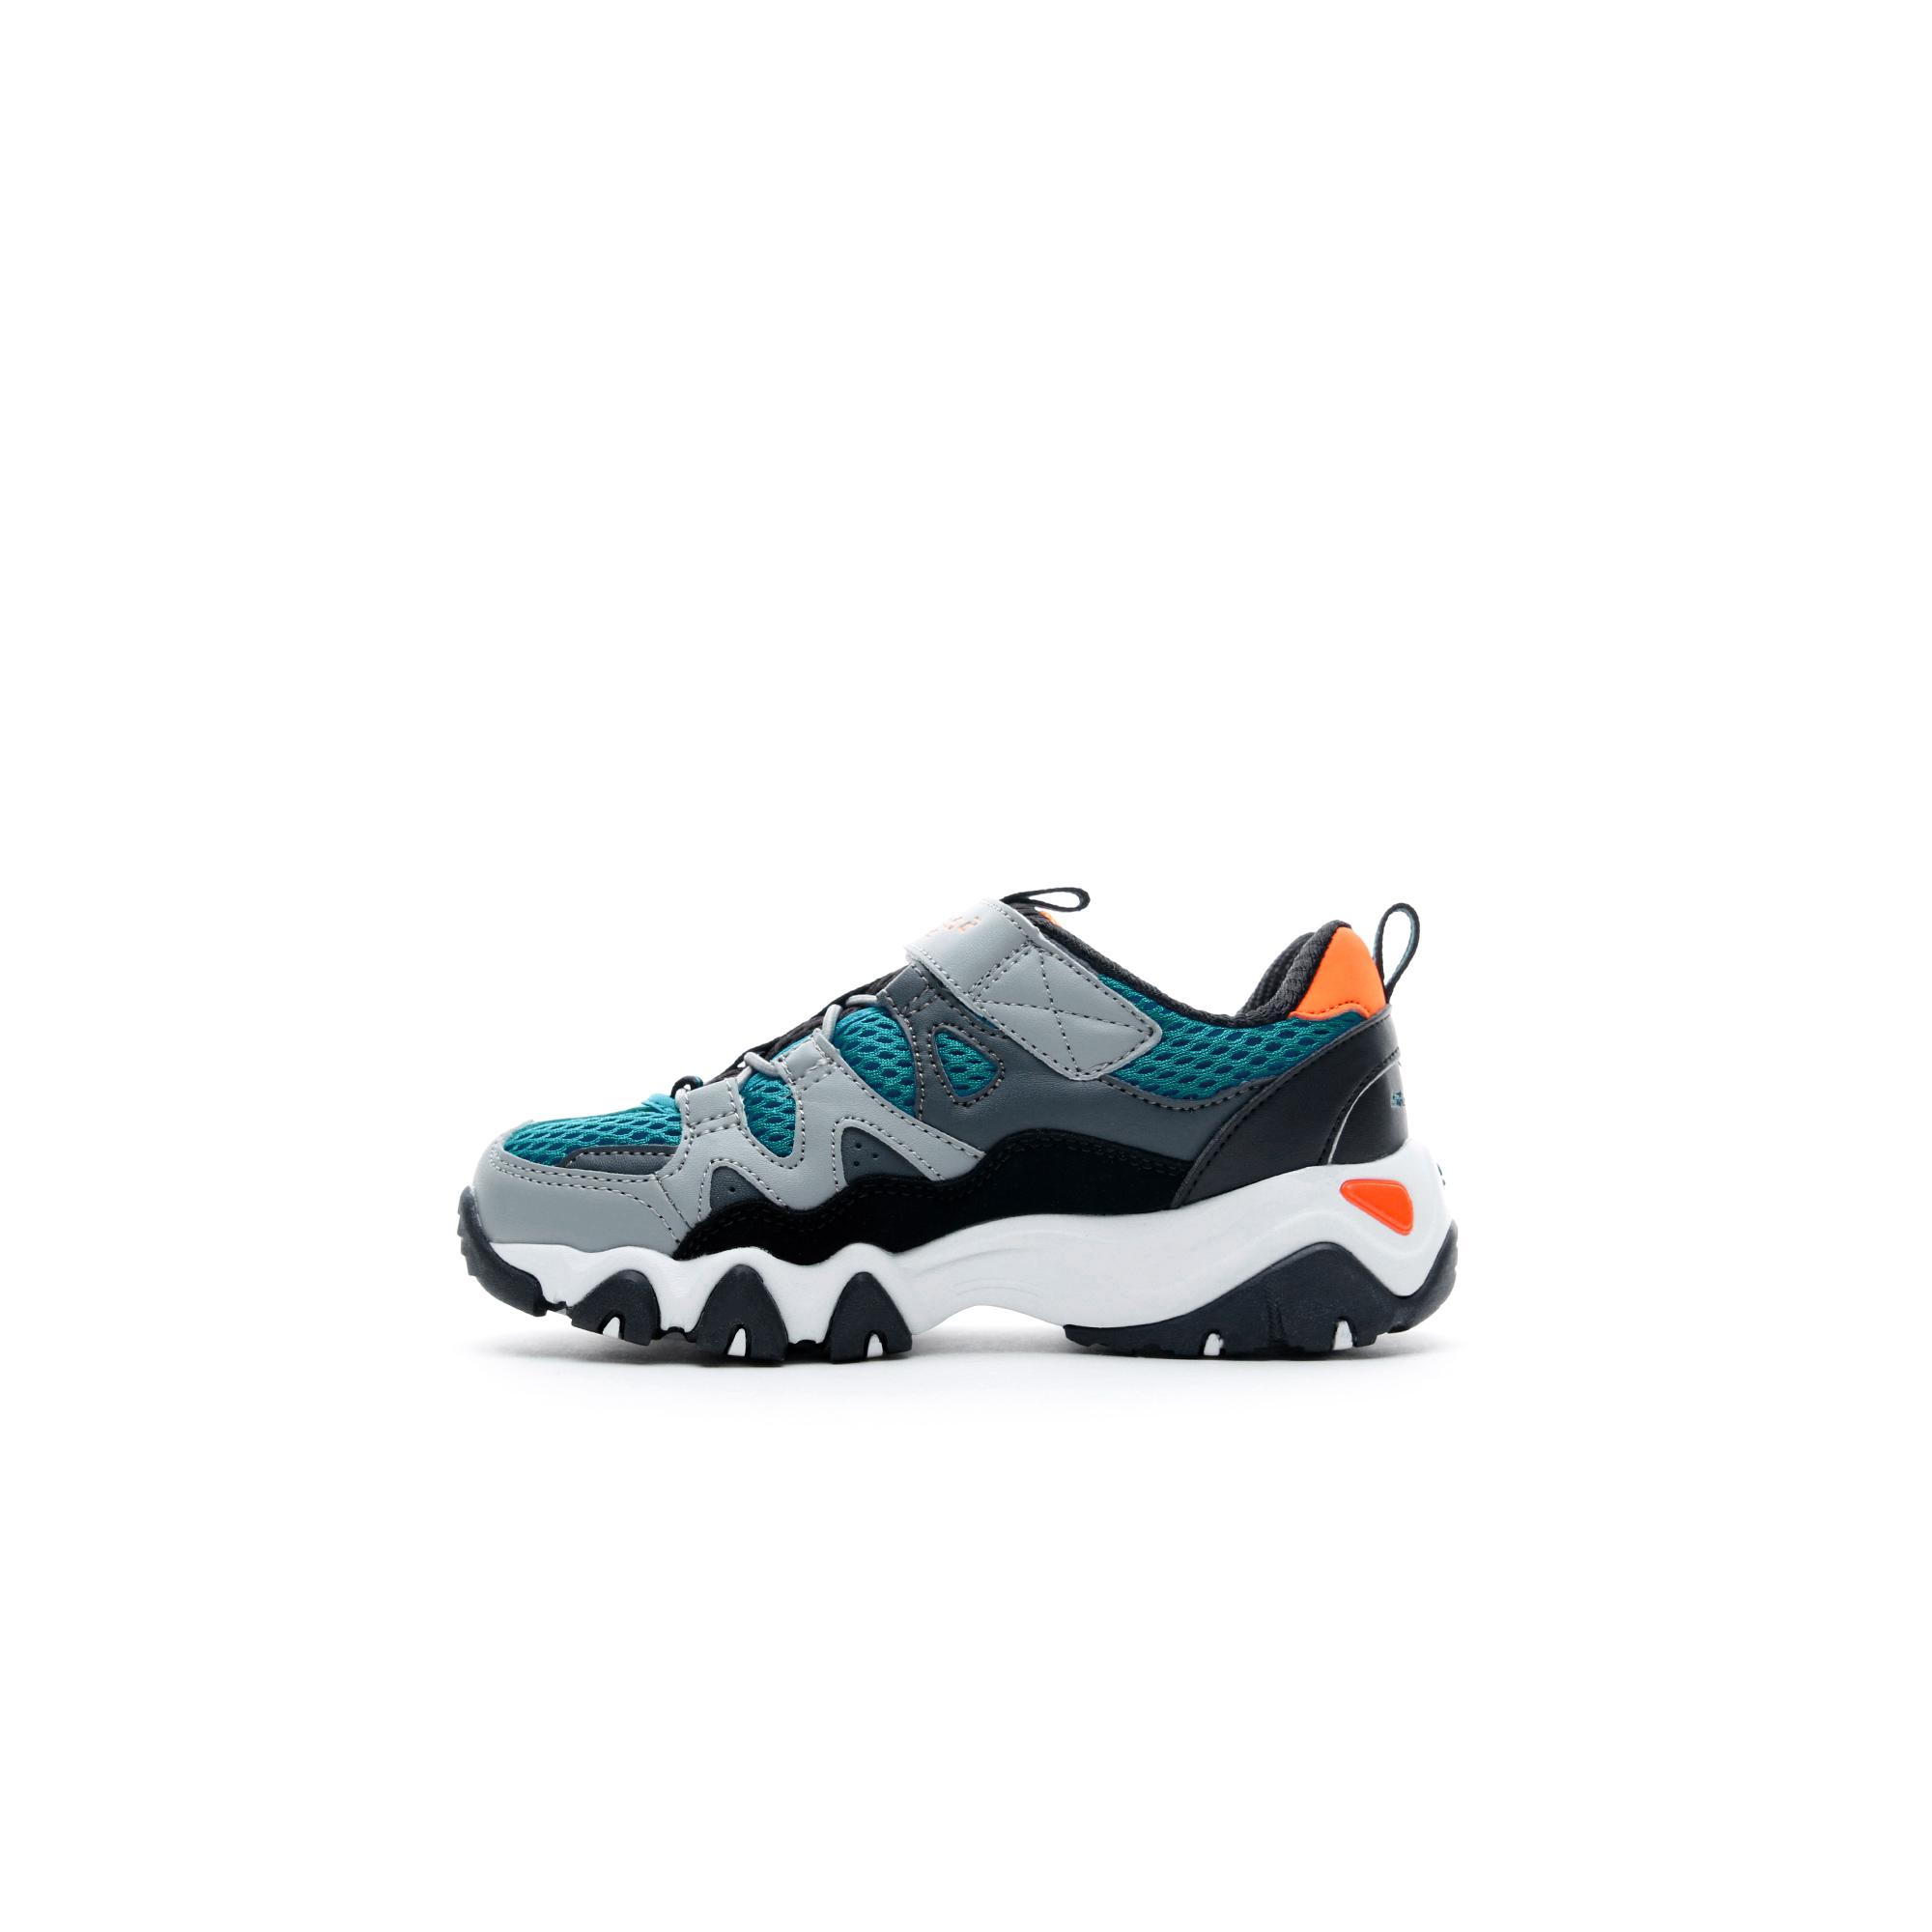 Skechers D'Lites 2,0 - Nano-Waves Gri Çocuk Spor Ayakkabı